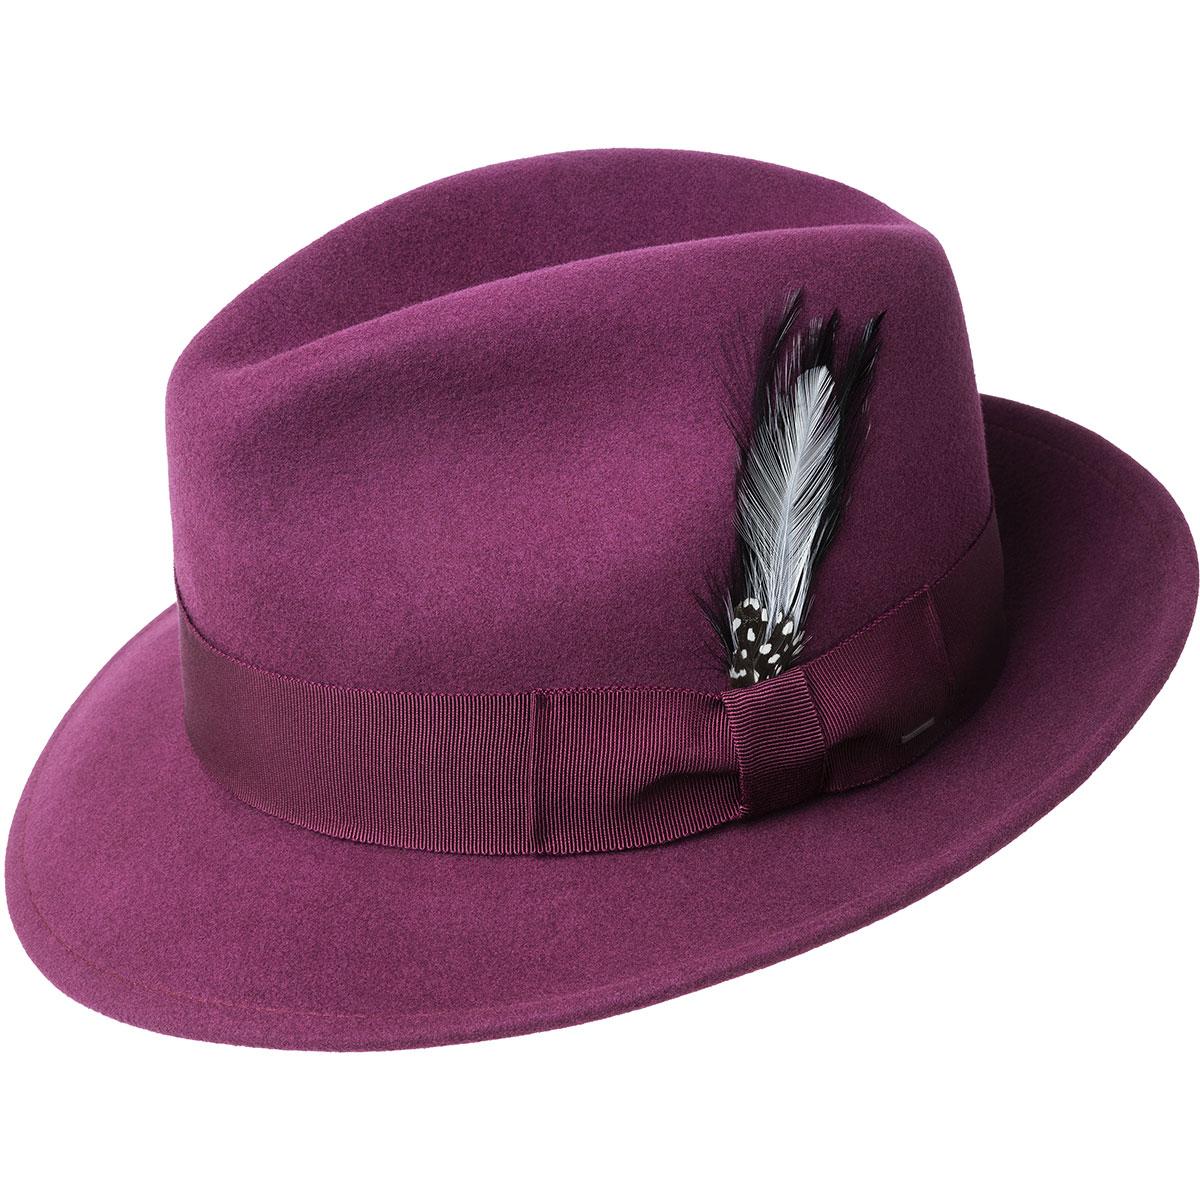 1960s – 70s Style Men's Hats Blixen Limited Edition Fedora $98.00 AT vintagedancer.com